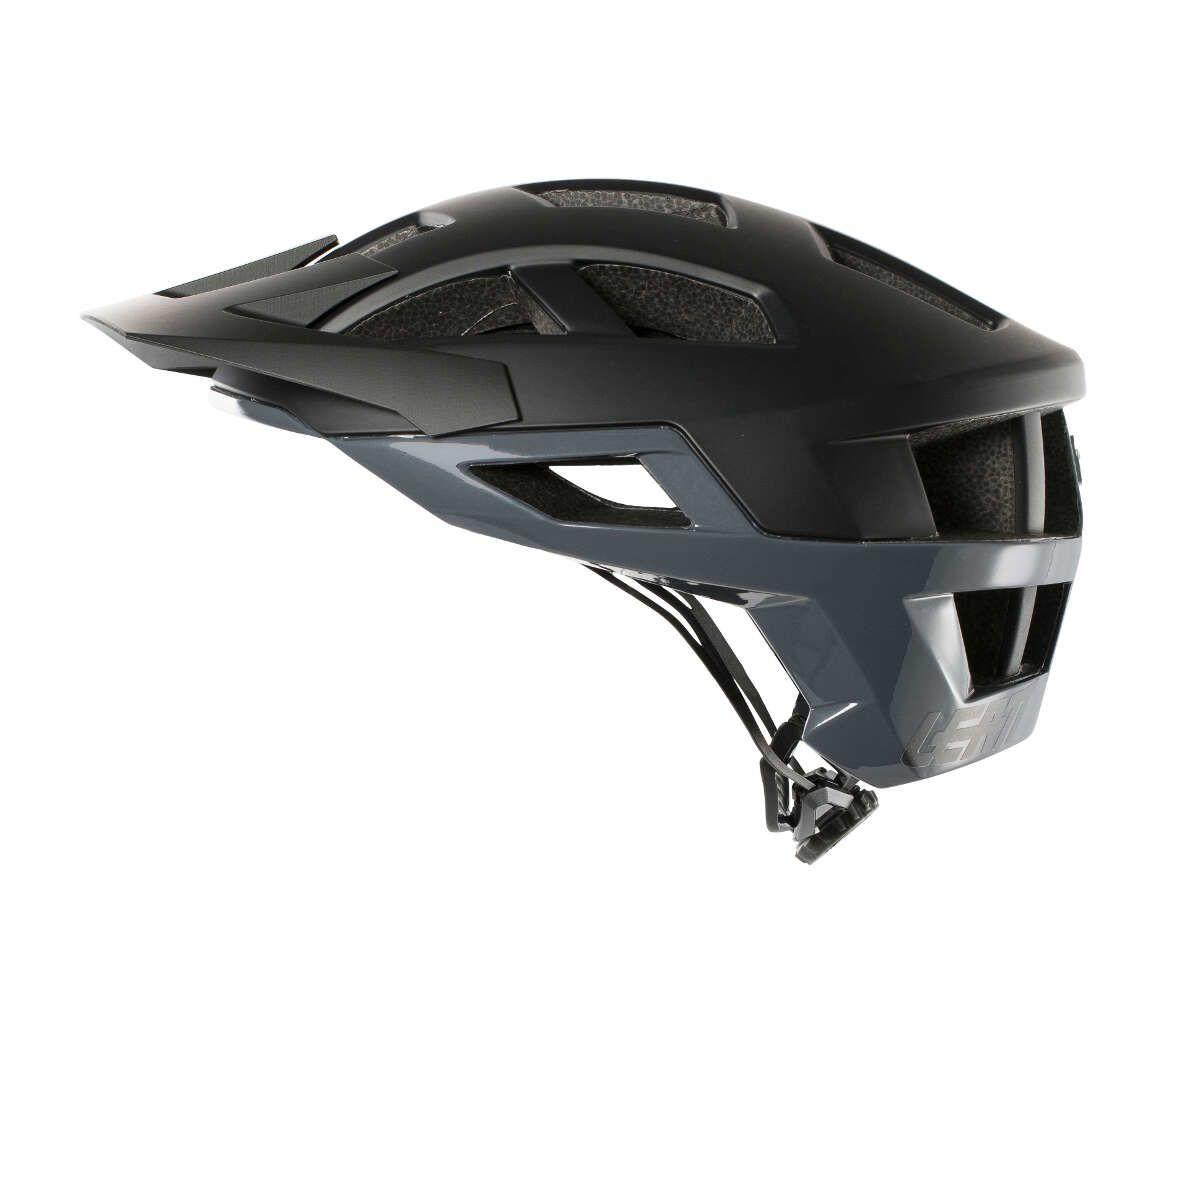 Casco DBX 2.0 Black/Granite